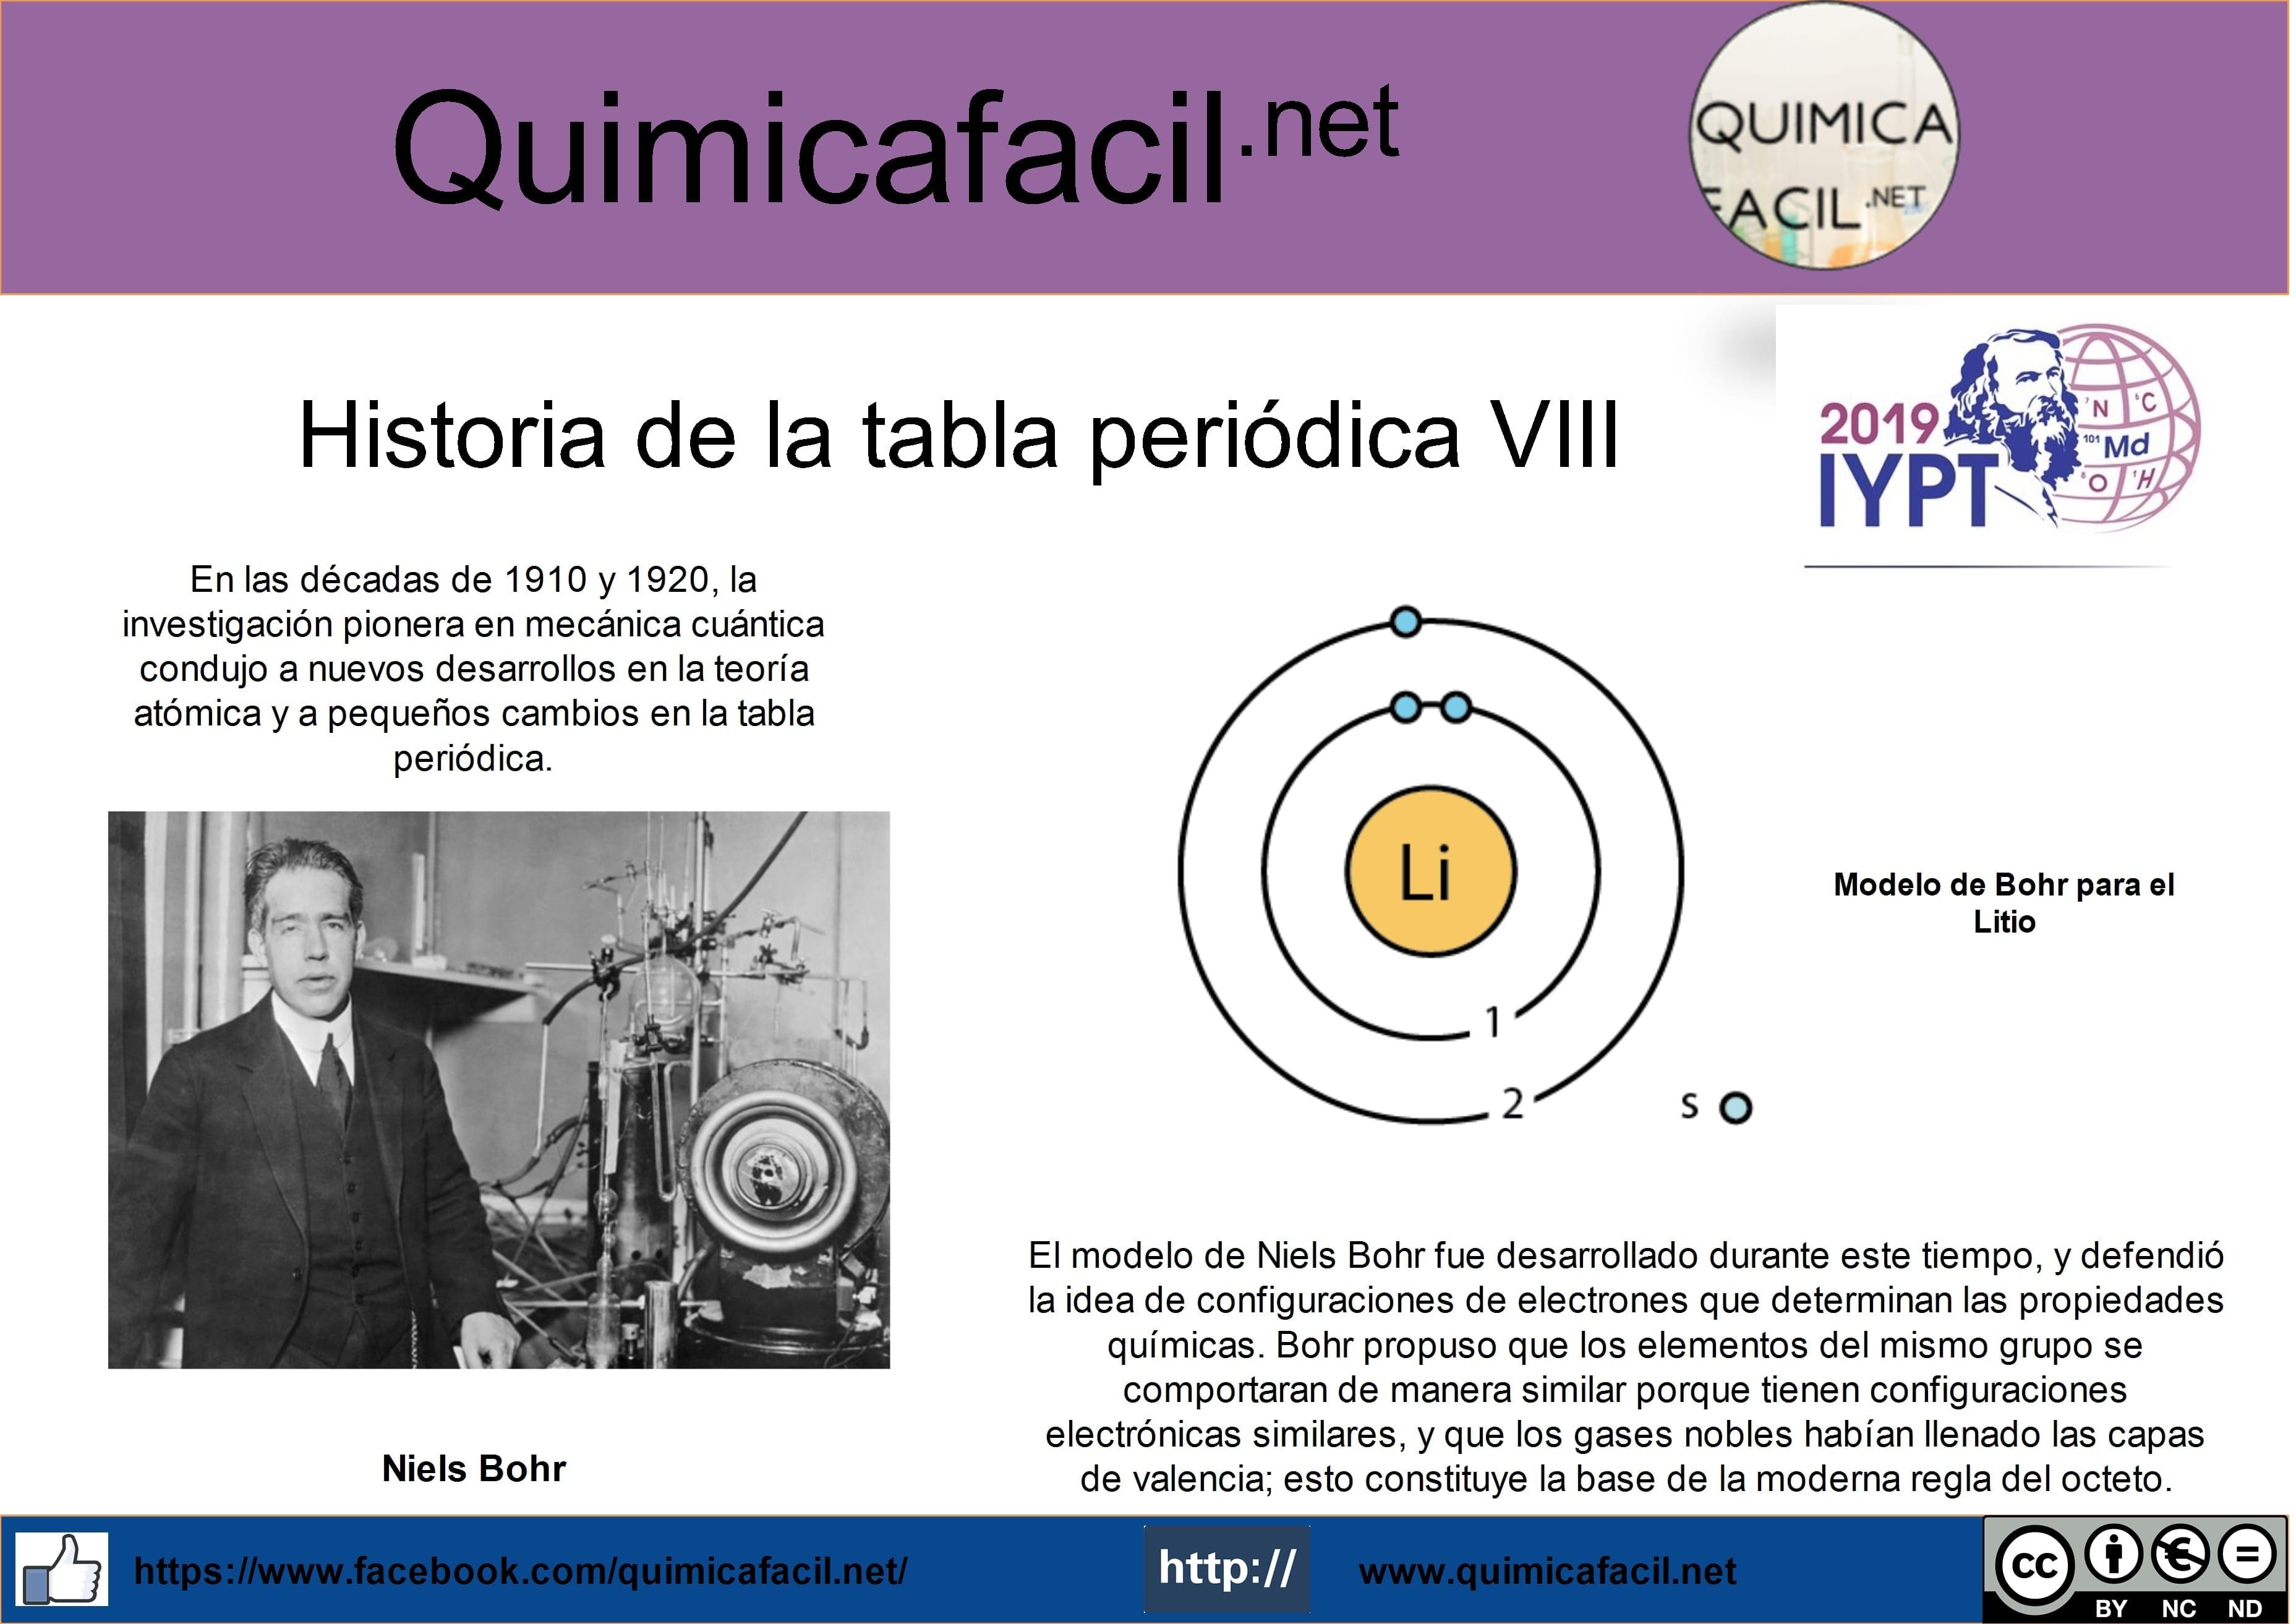 Historia de la tabla periódica VIII